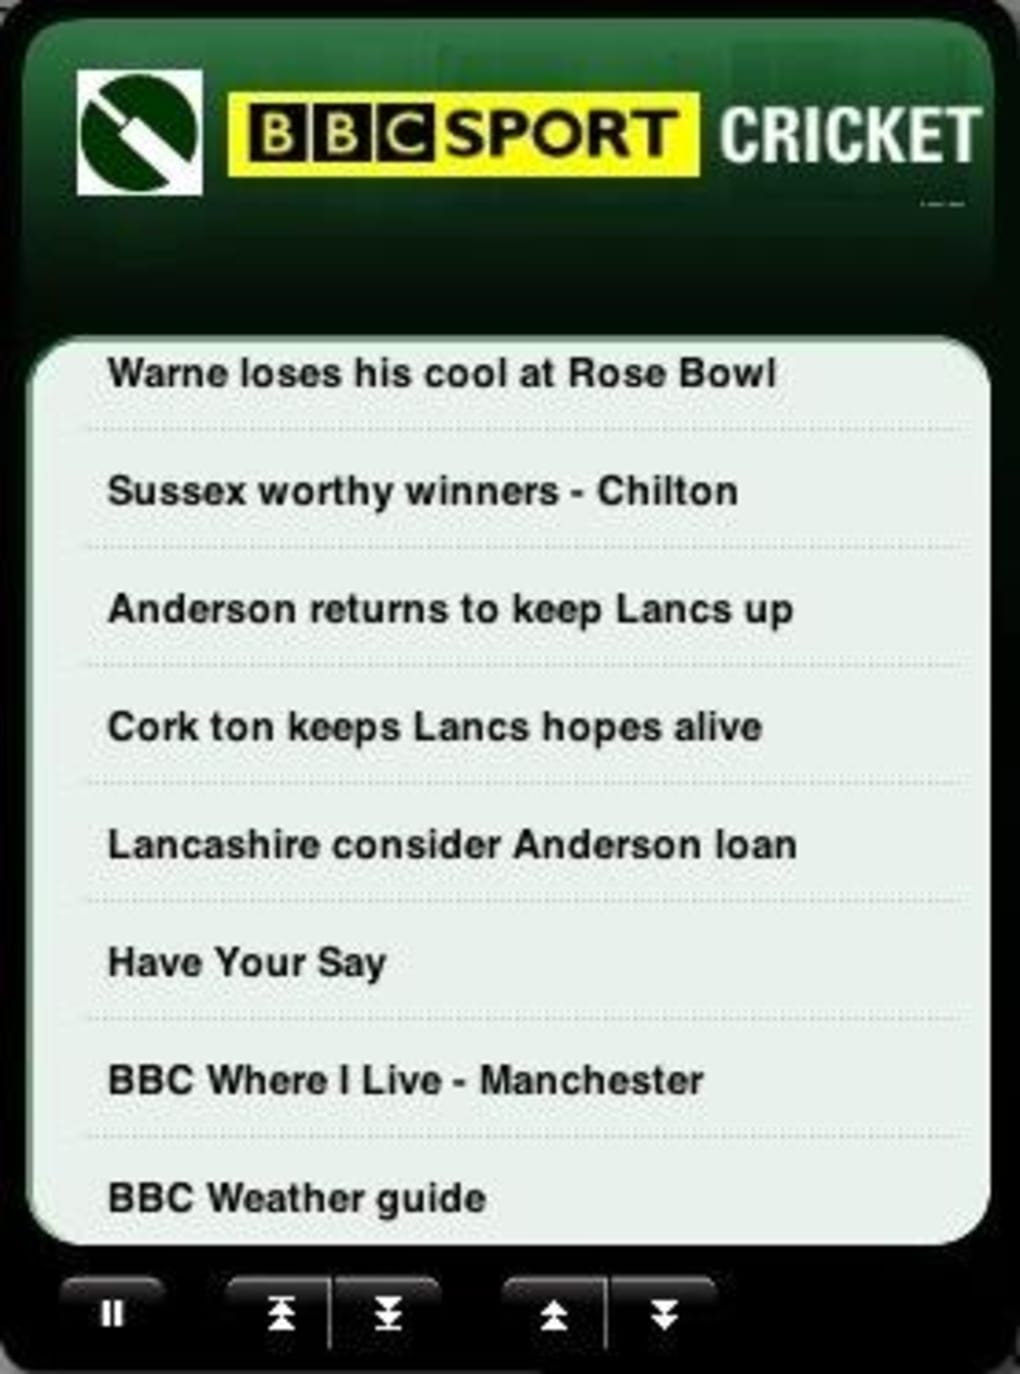 BBC Cricket Widget for Mac - Download